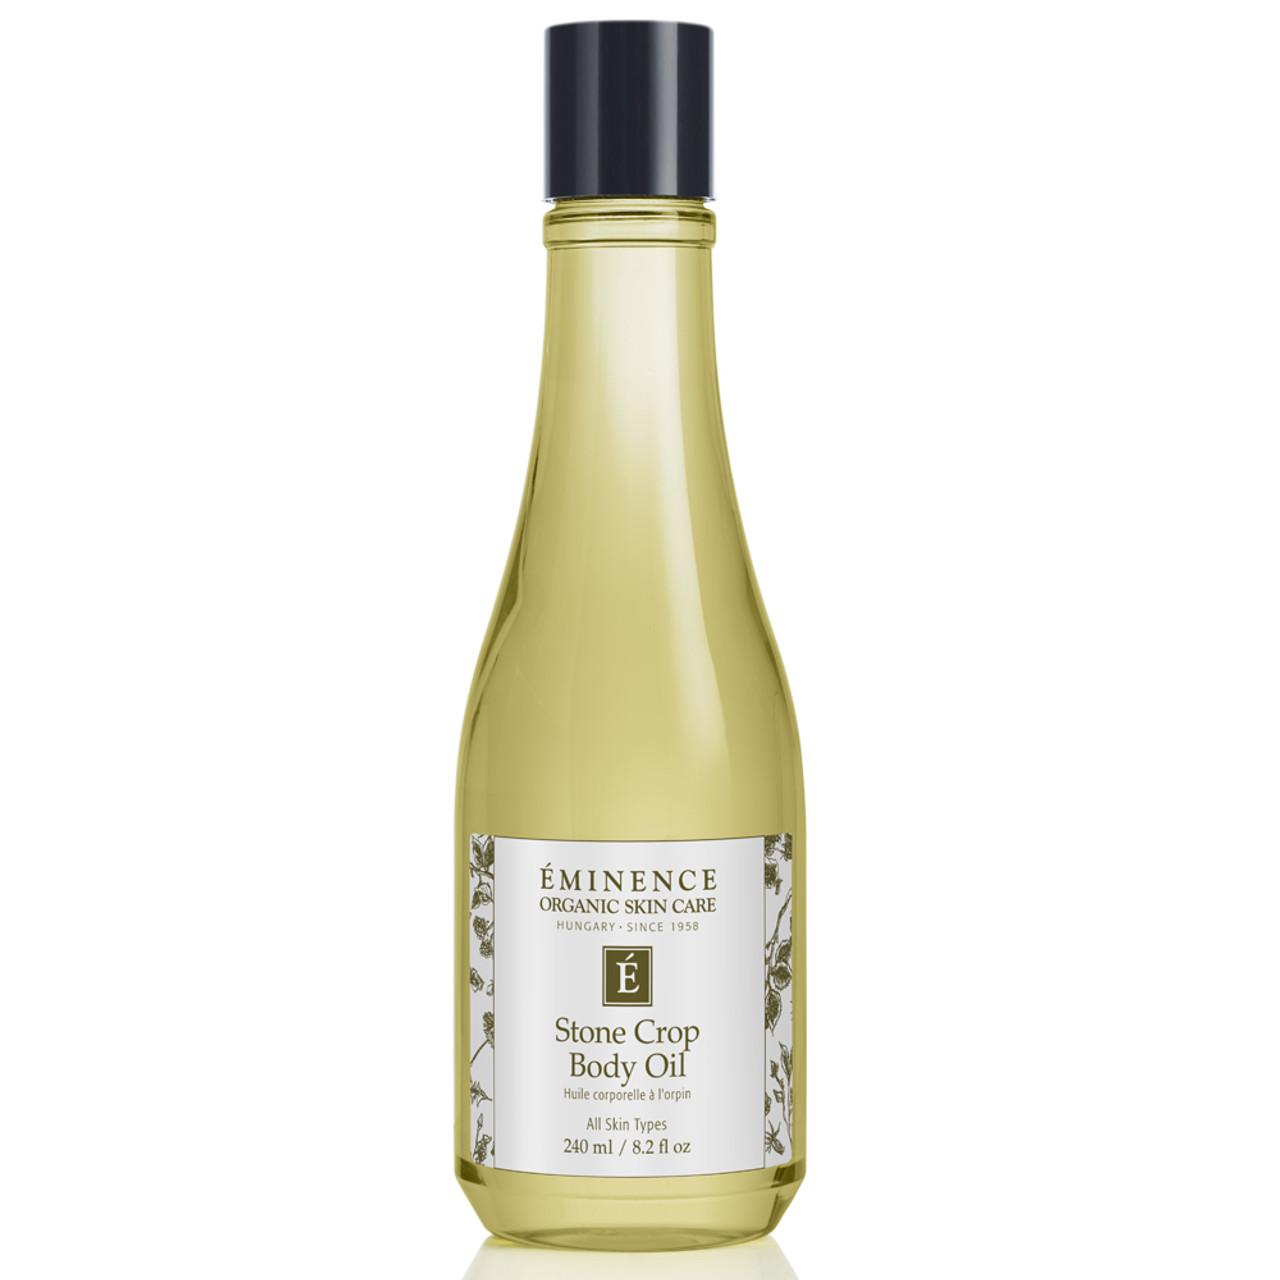 Eminence Stone Crop Body Oil BeautifiedYou.com